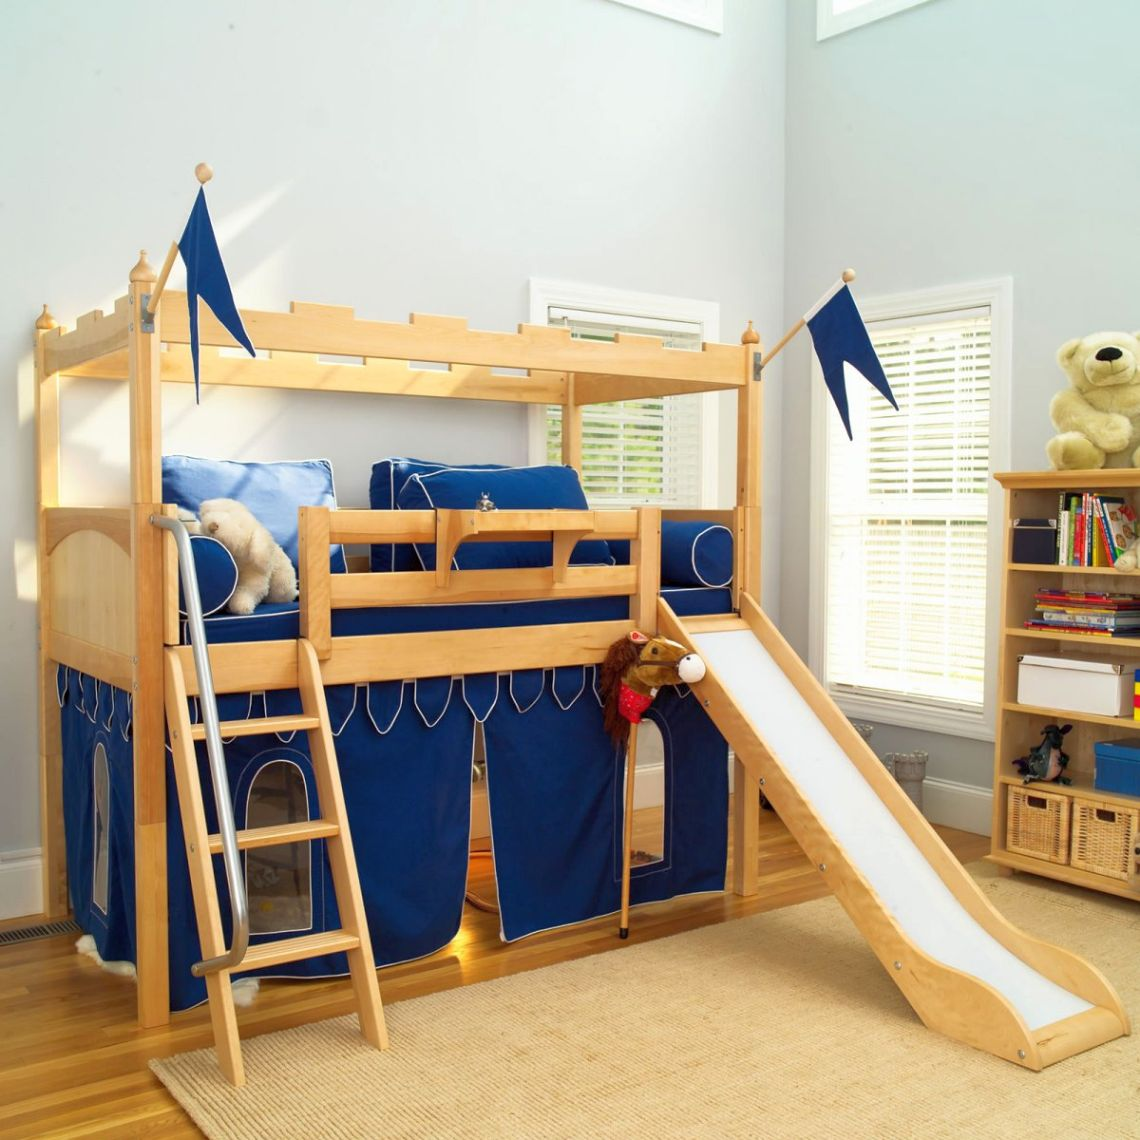 Cool kids bunk beds with slide - Gallery For Modern Kids Loft Beds Designs